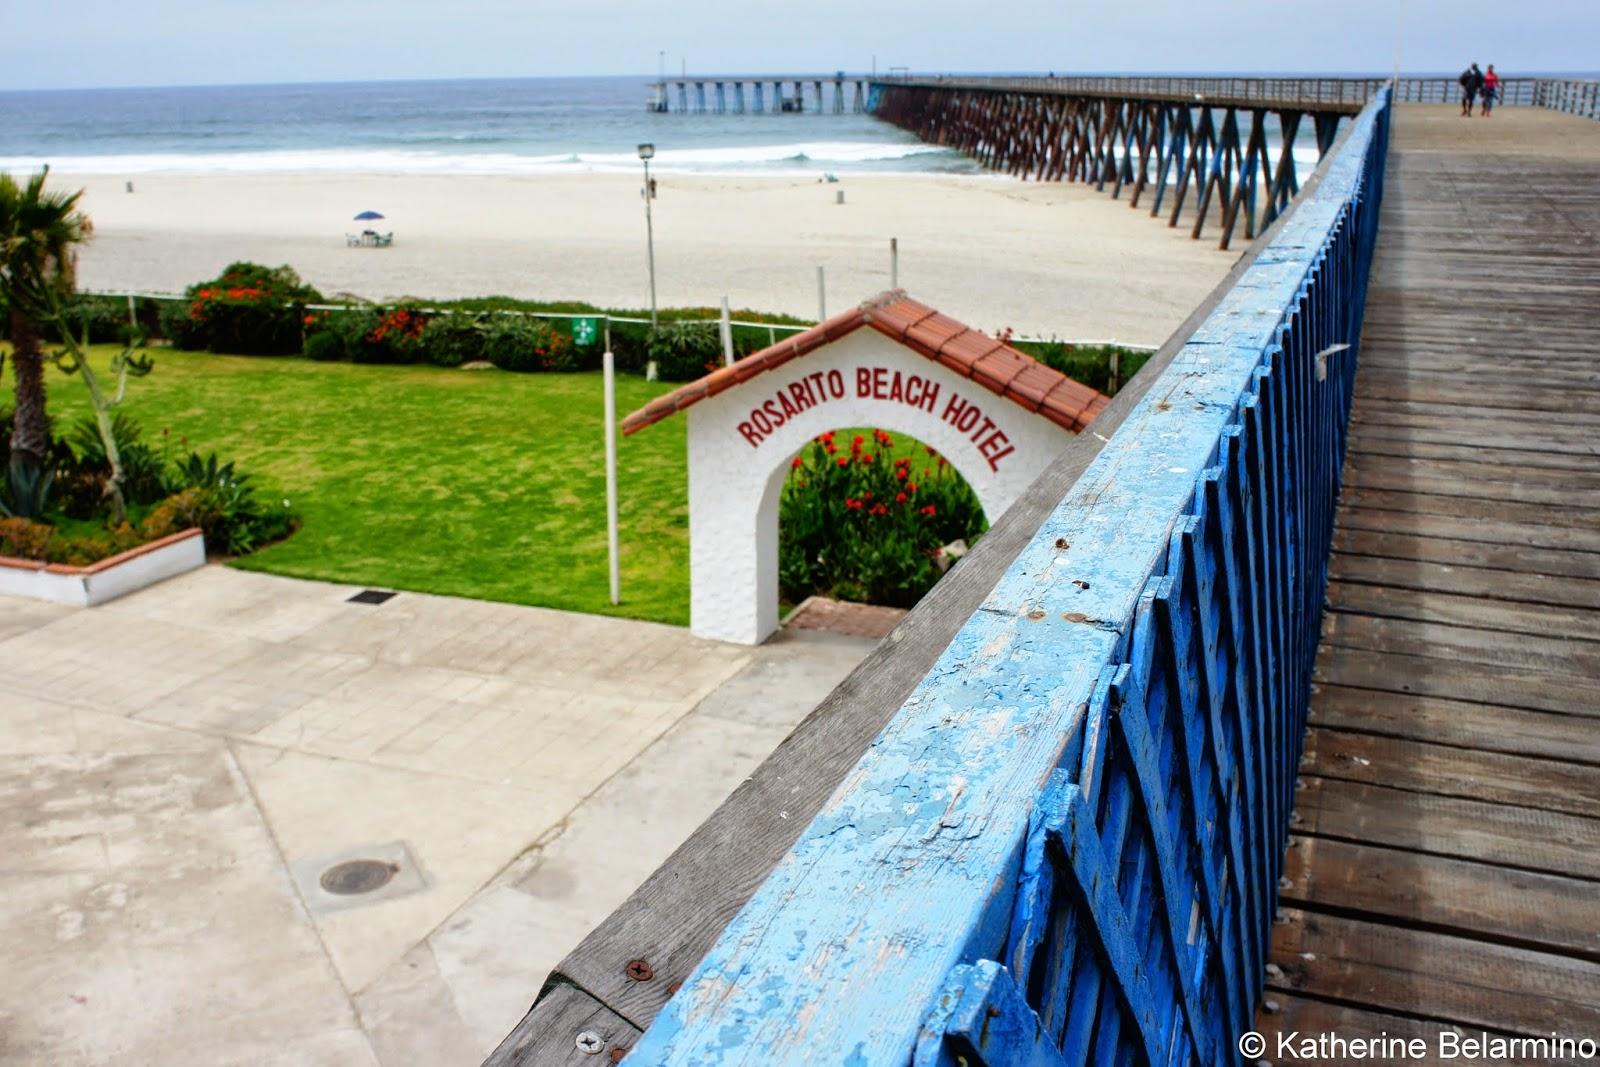 Rosarito Beach Hotel Pier Baja California Mexico